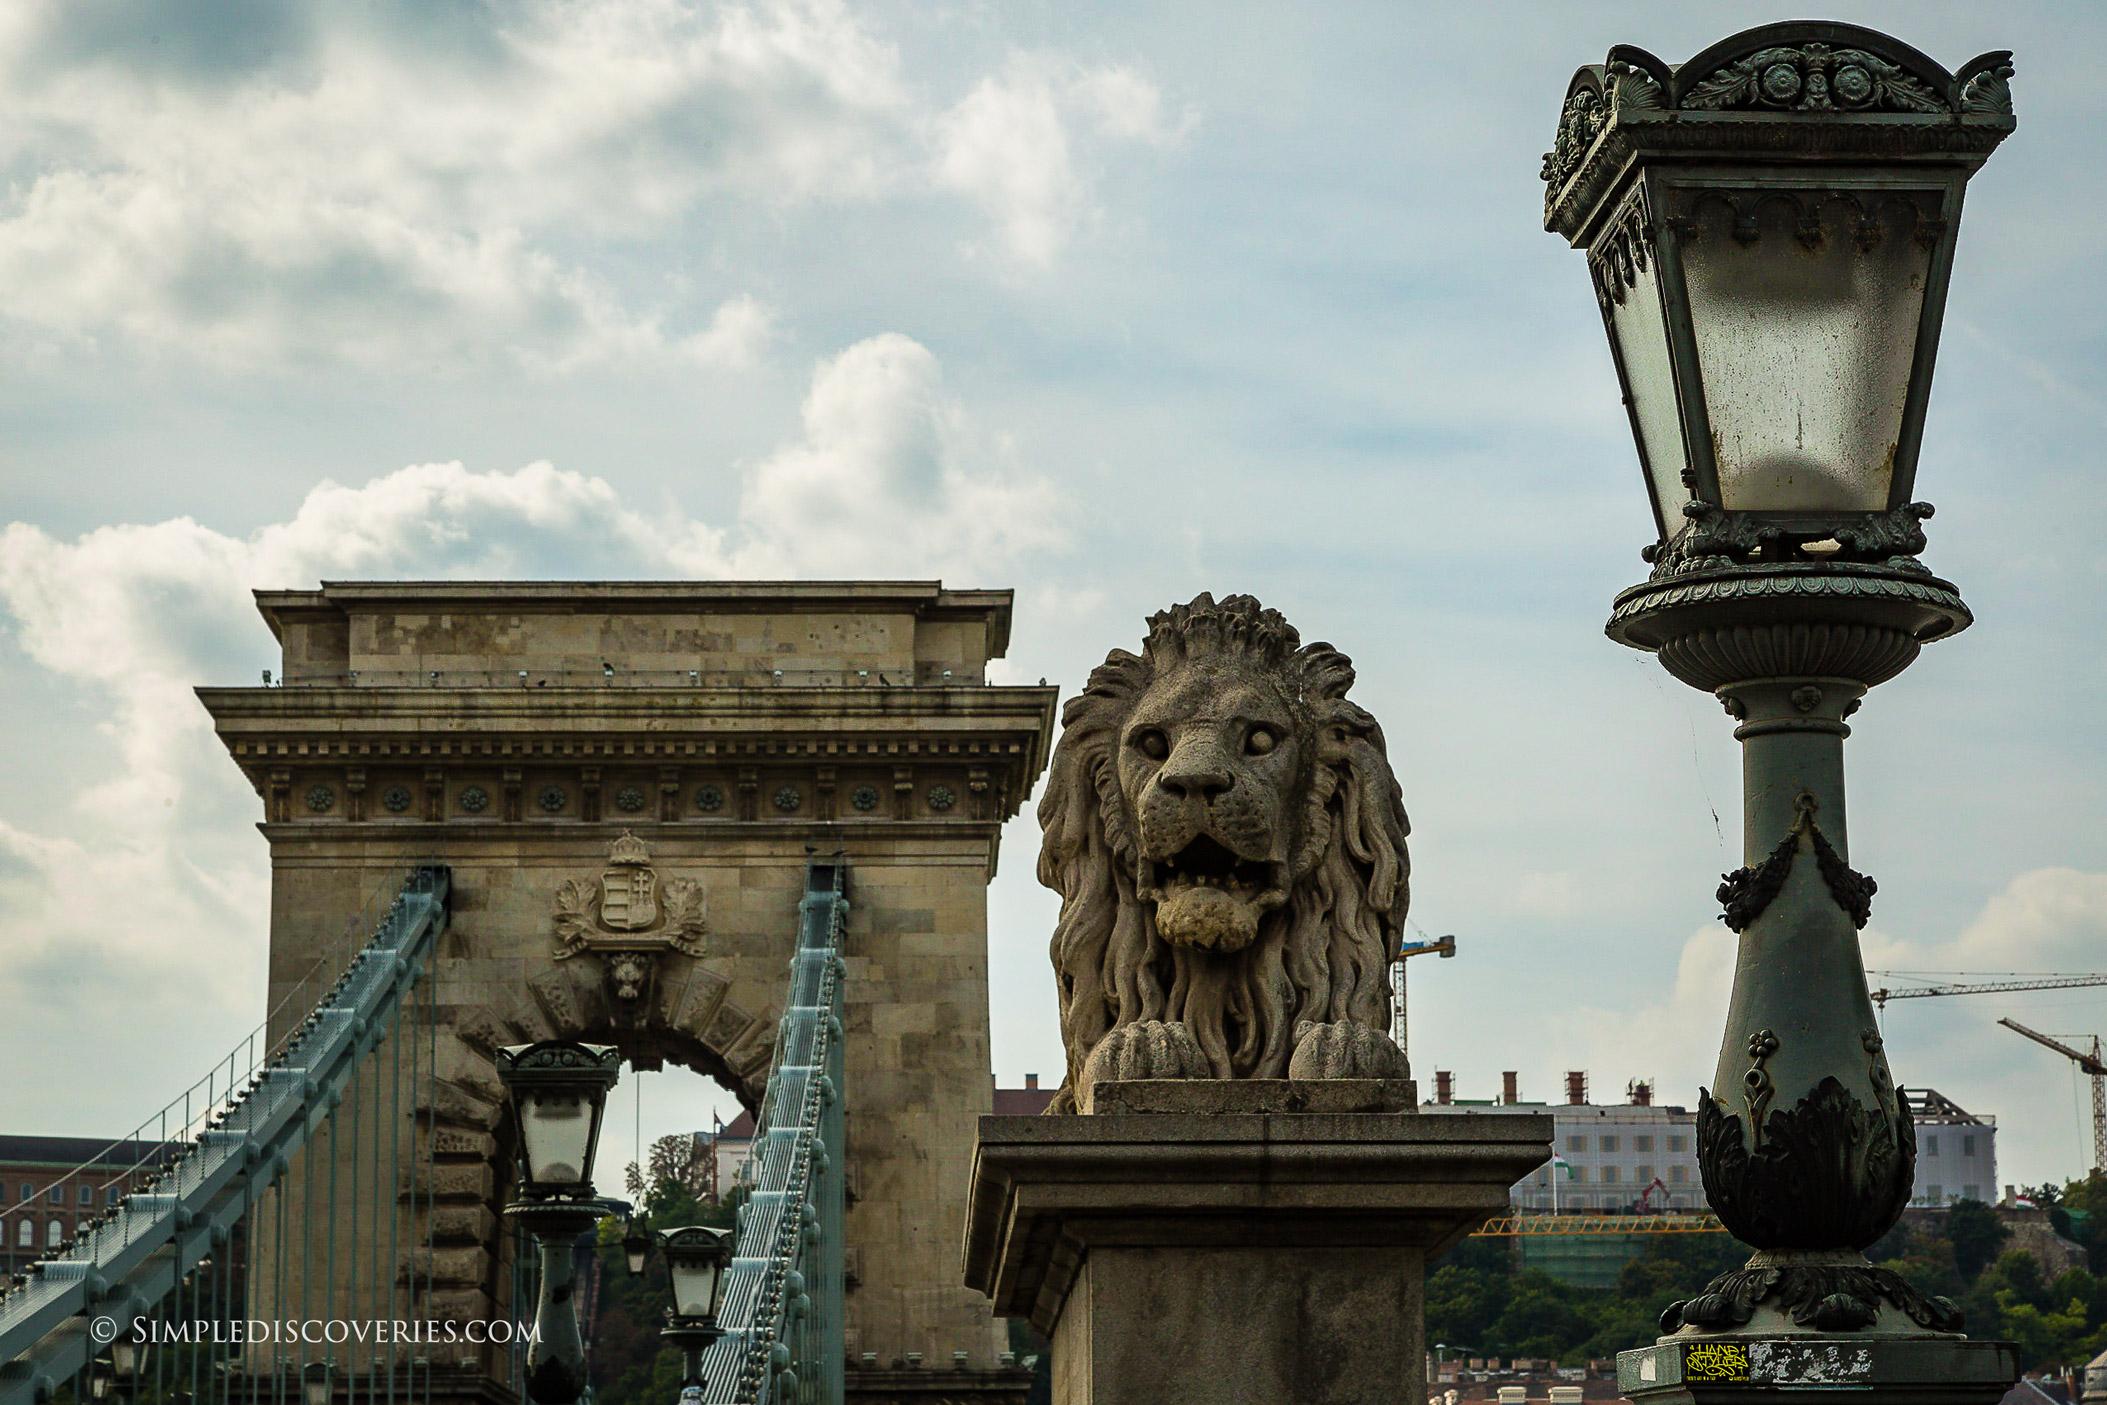 chain_link_bridge_budapest